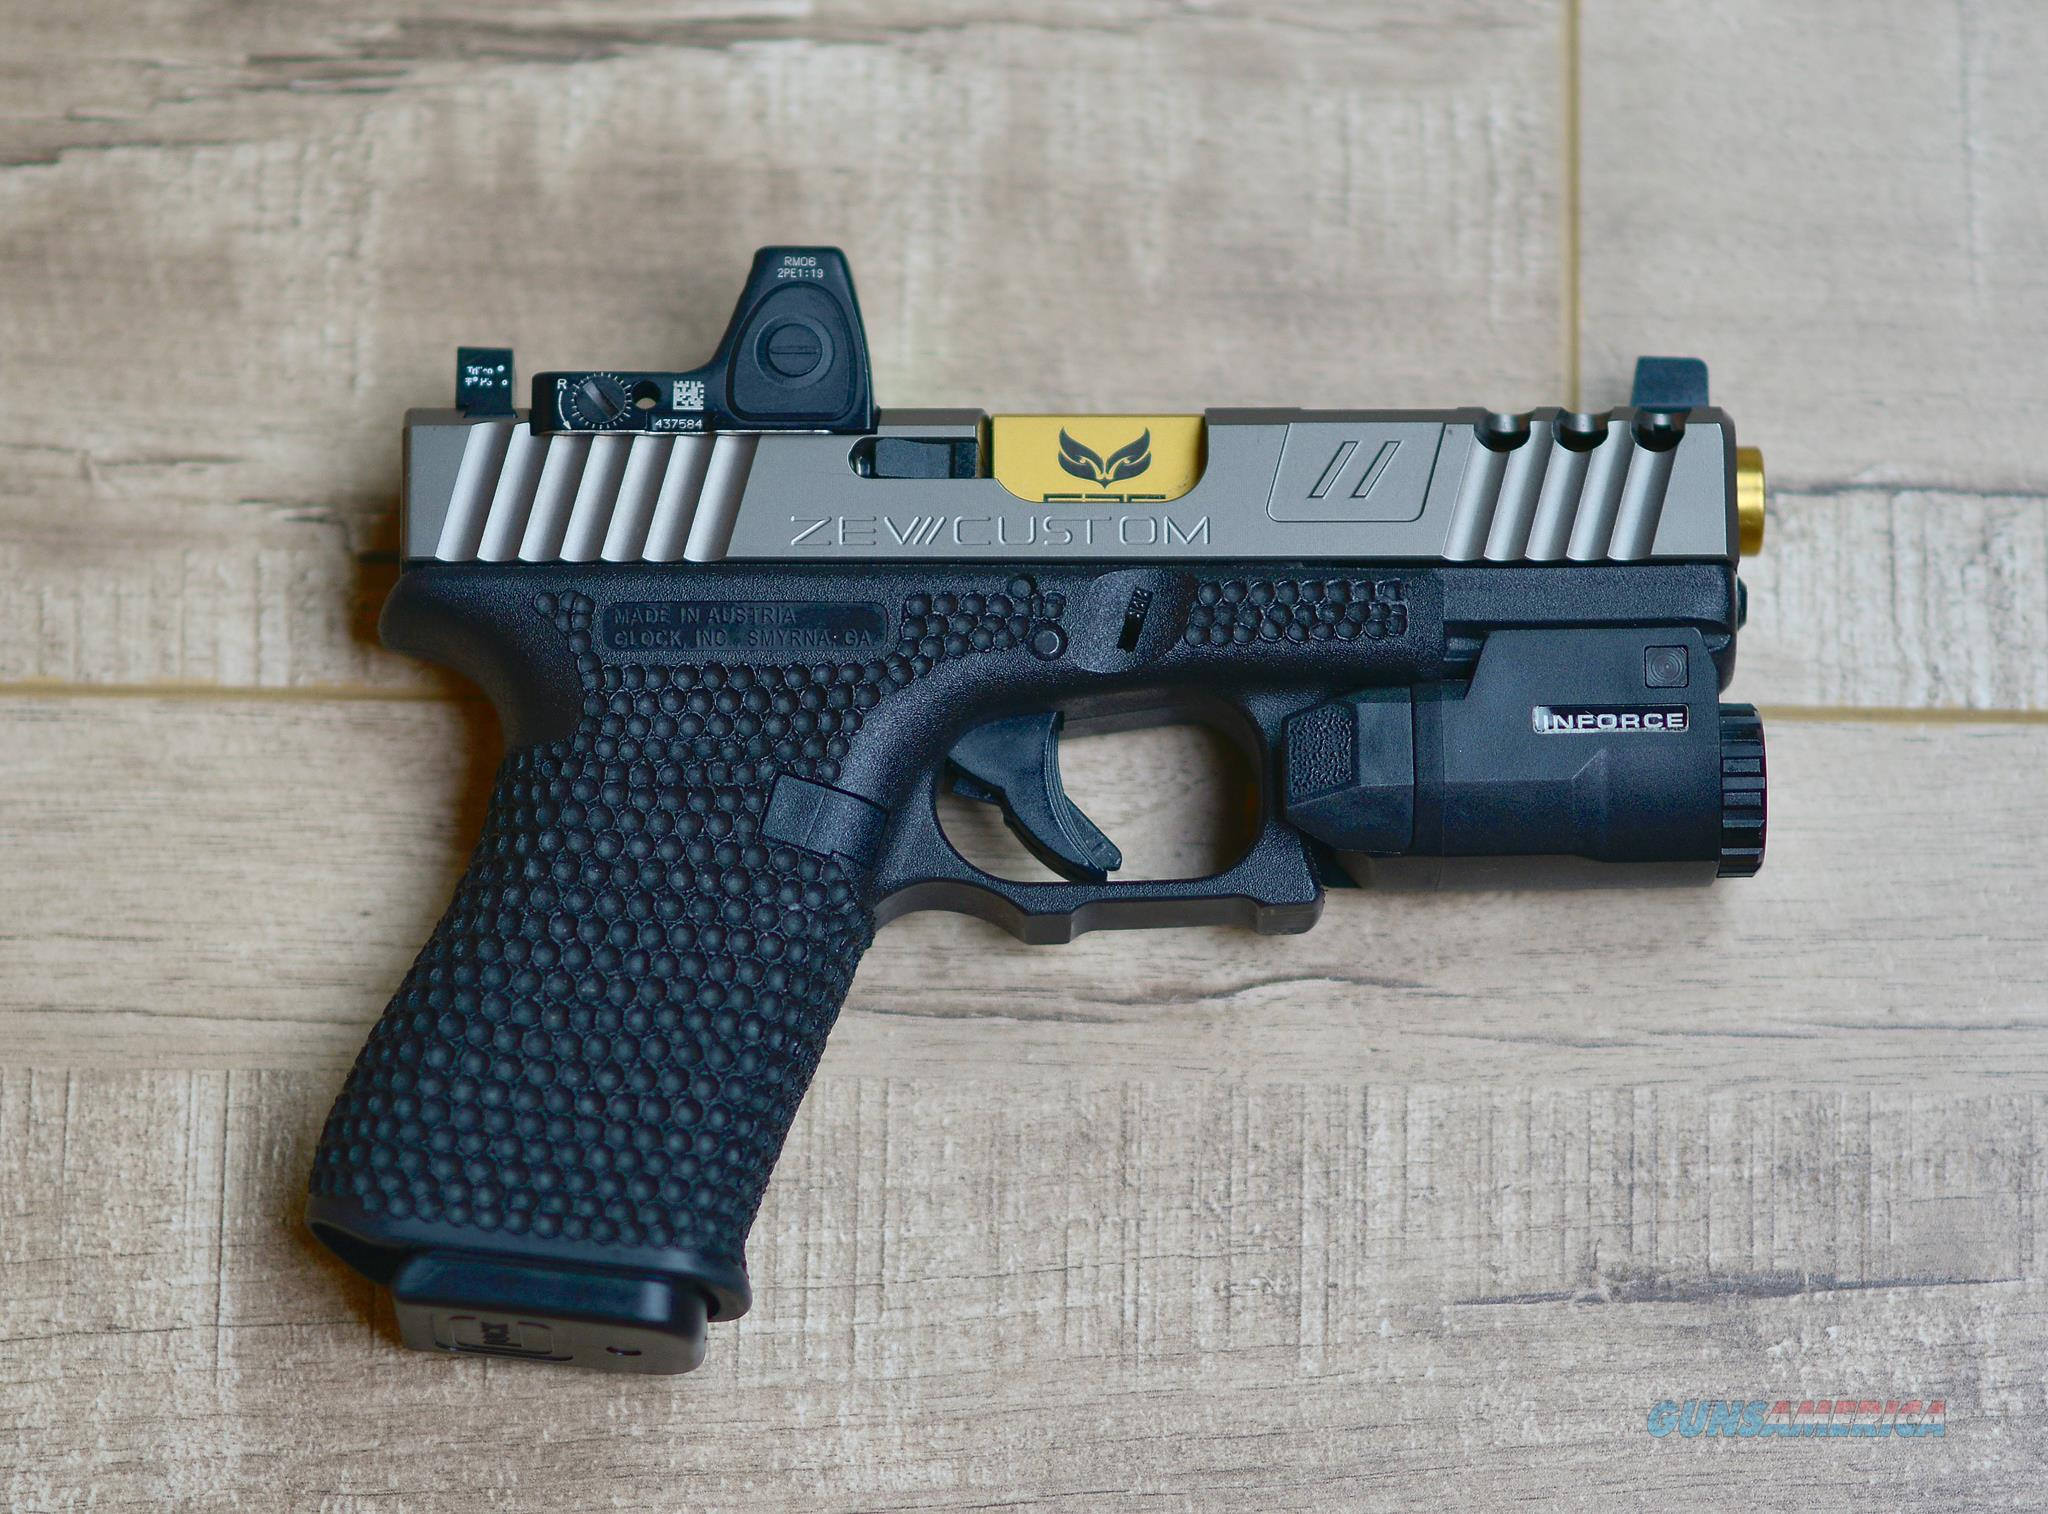 Glock 19 Upgraded,  California Compliant  Guns > Pistols > Glock Pistols > 19/19X